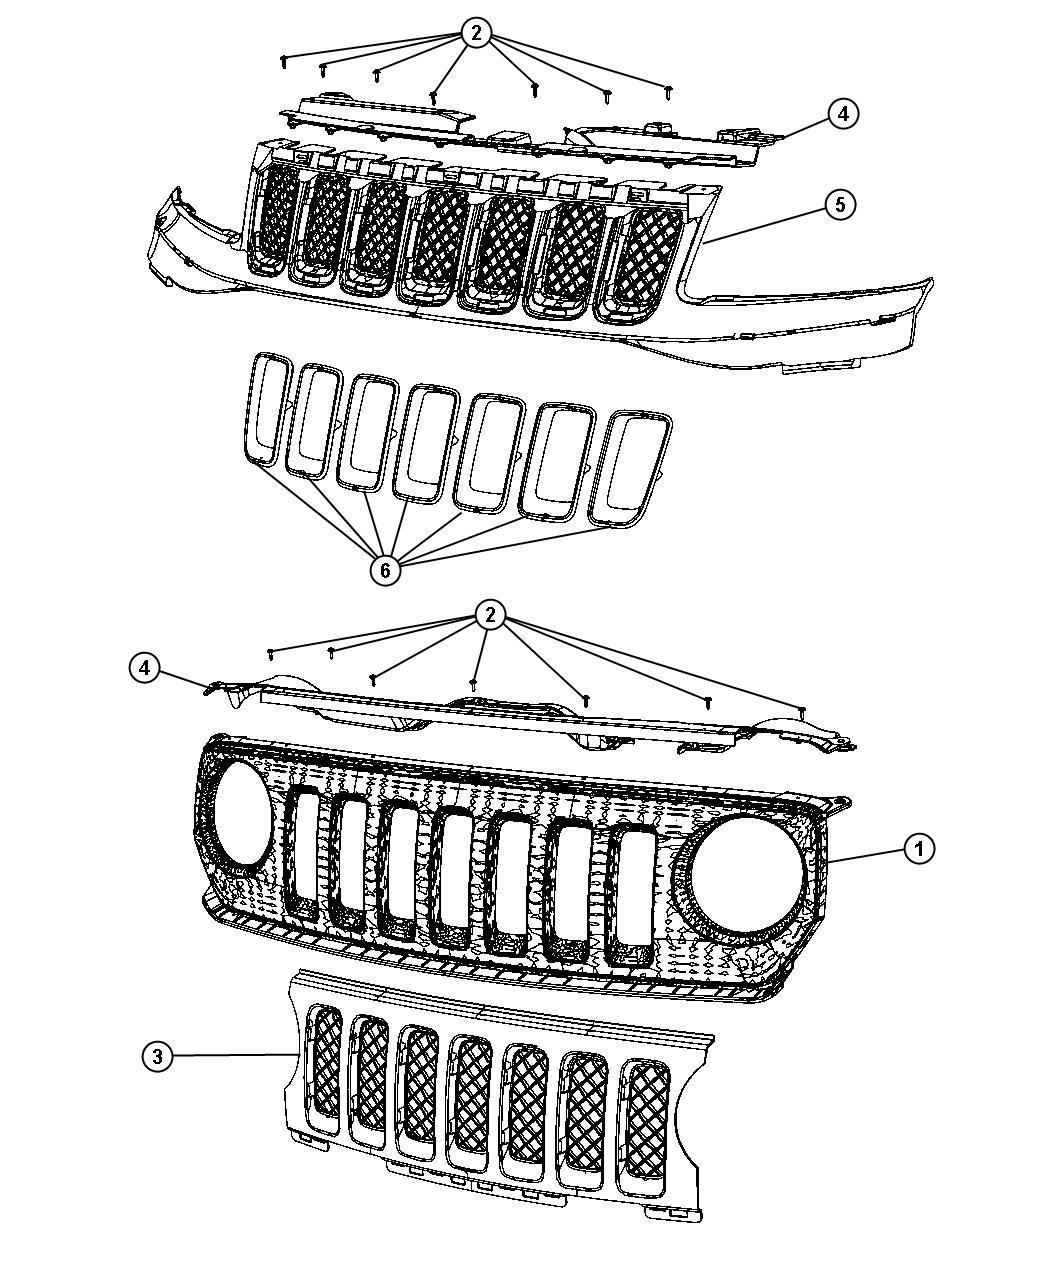 2011 Jeep Patriot Grille. Radiator. Color, body, fascias